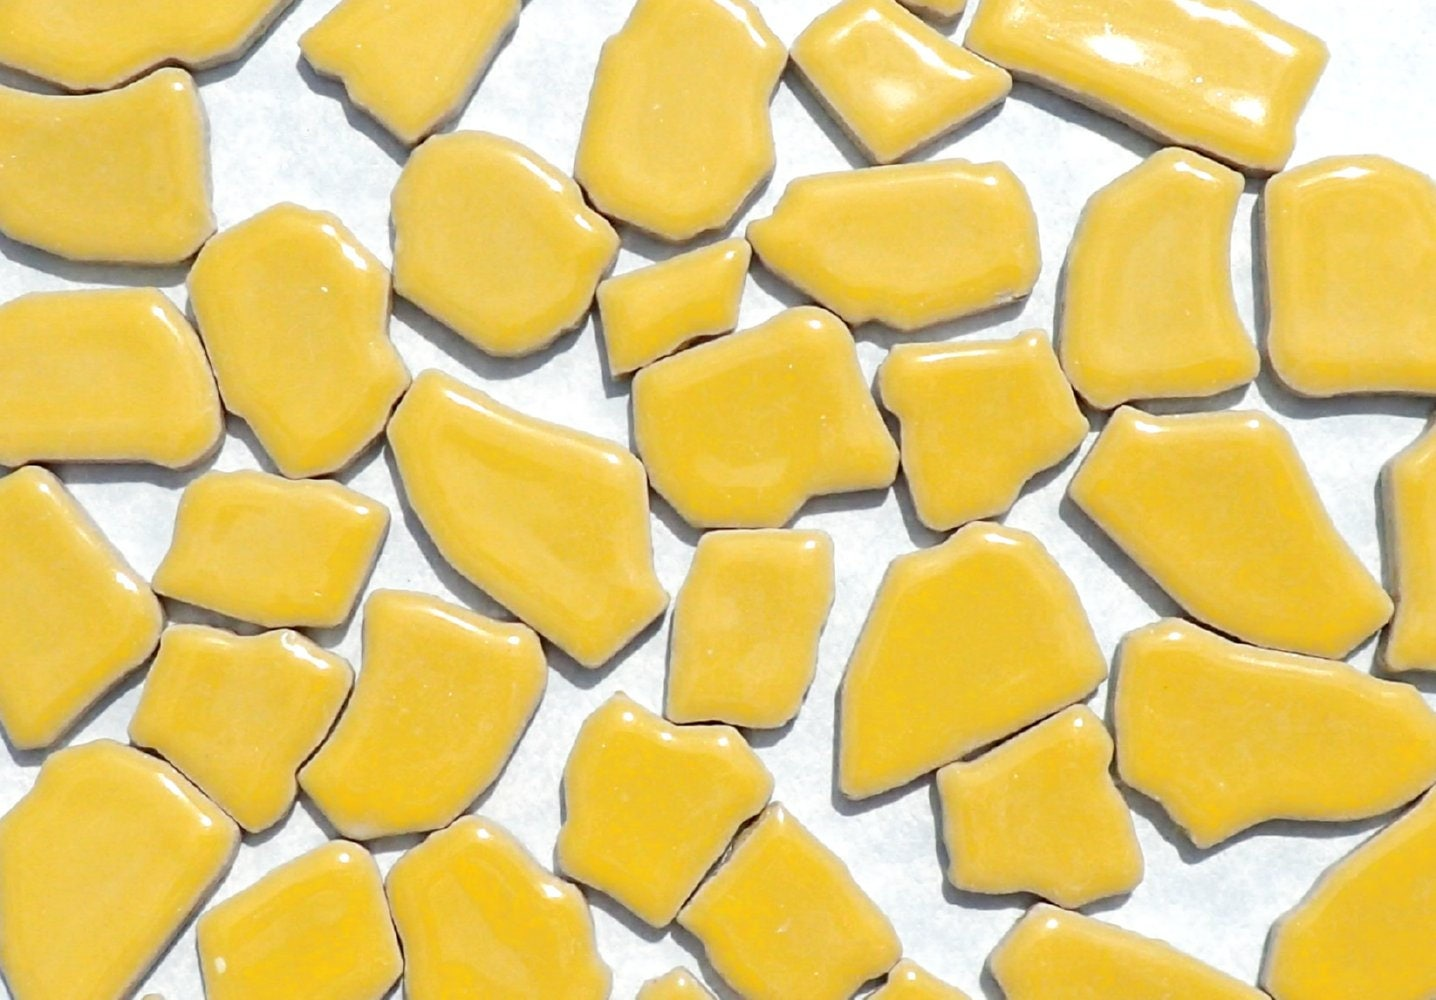 Yellow Mosaic Ceramic Tiles - Random Shapes - Half Pound - Assorted ...